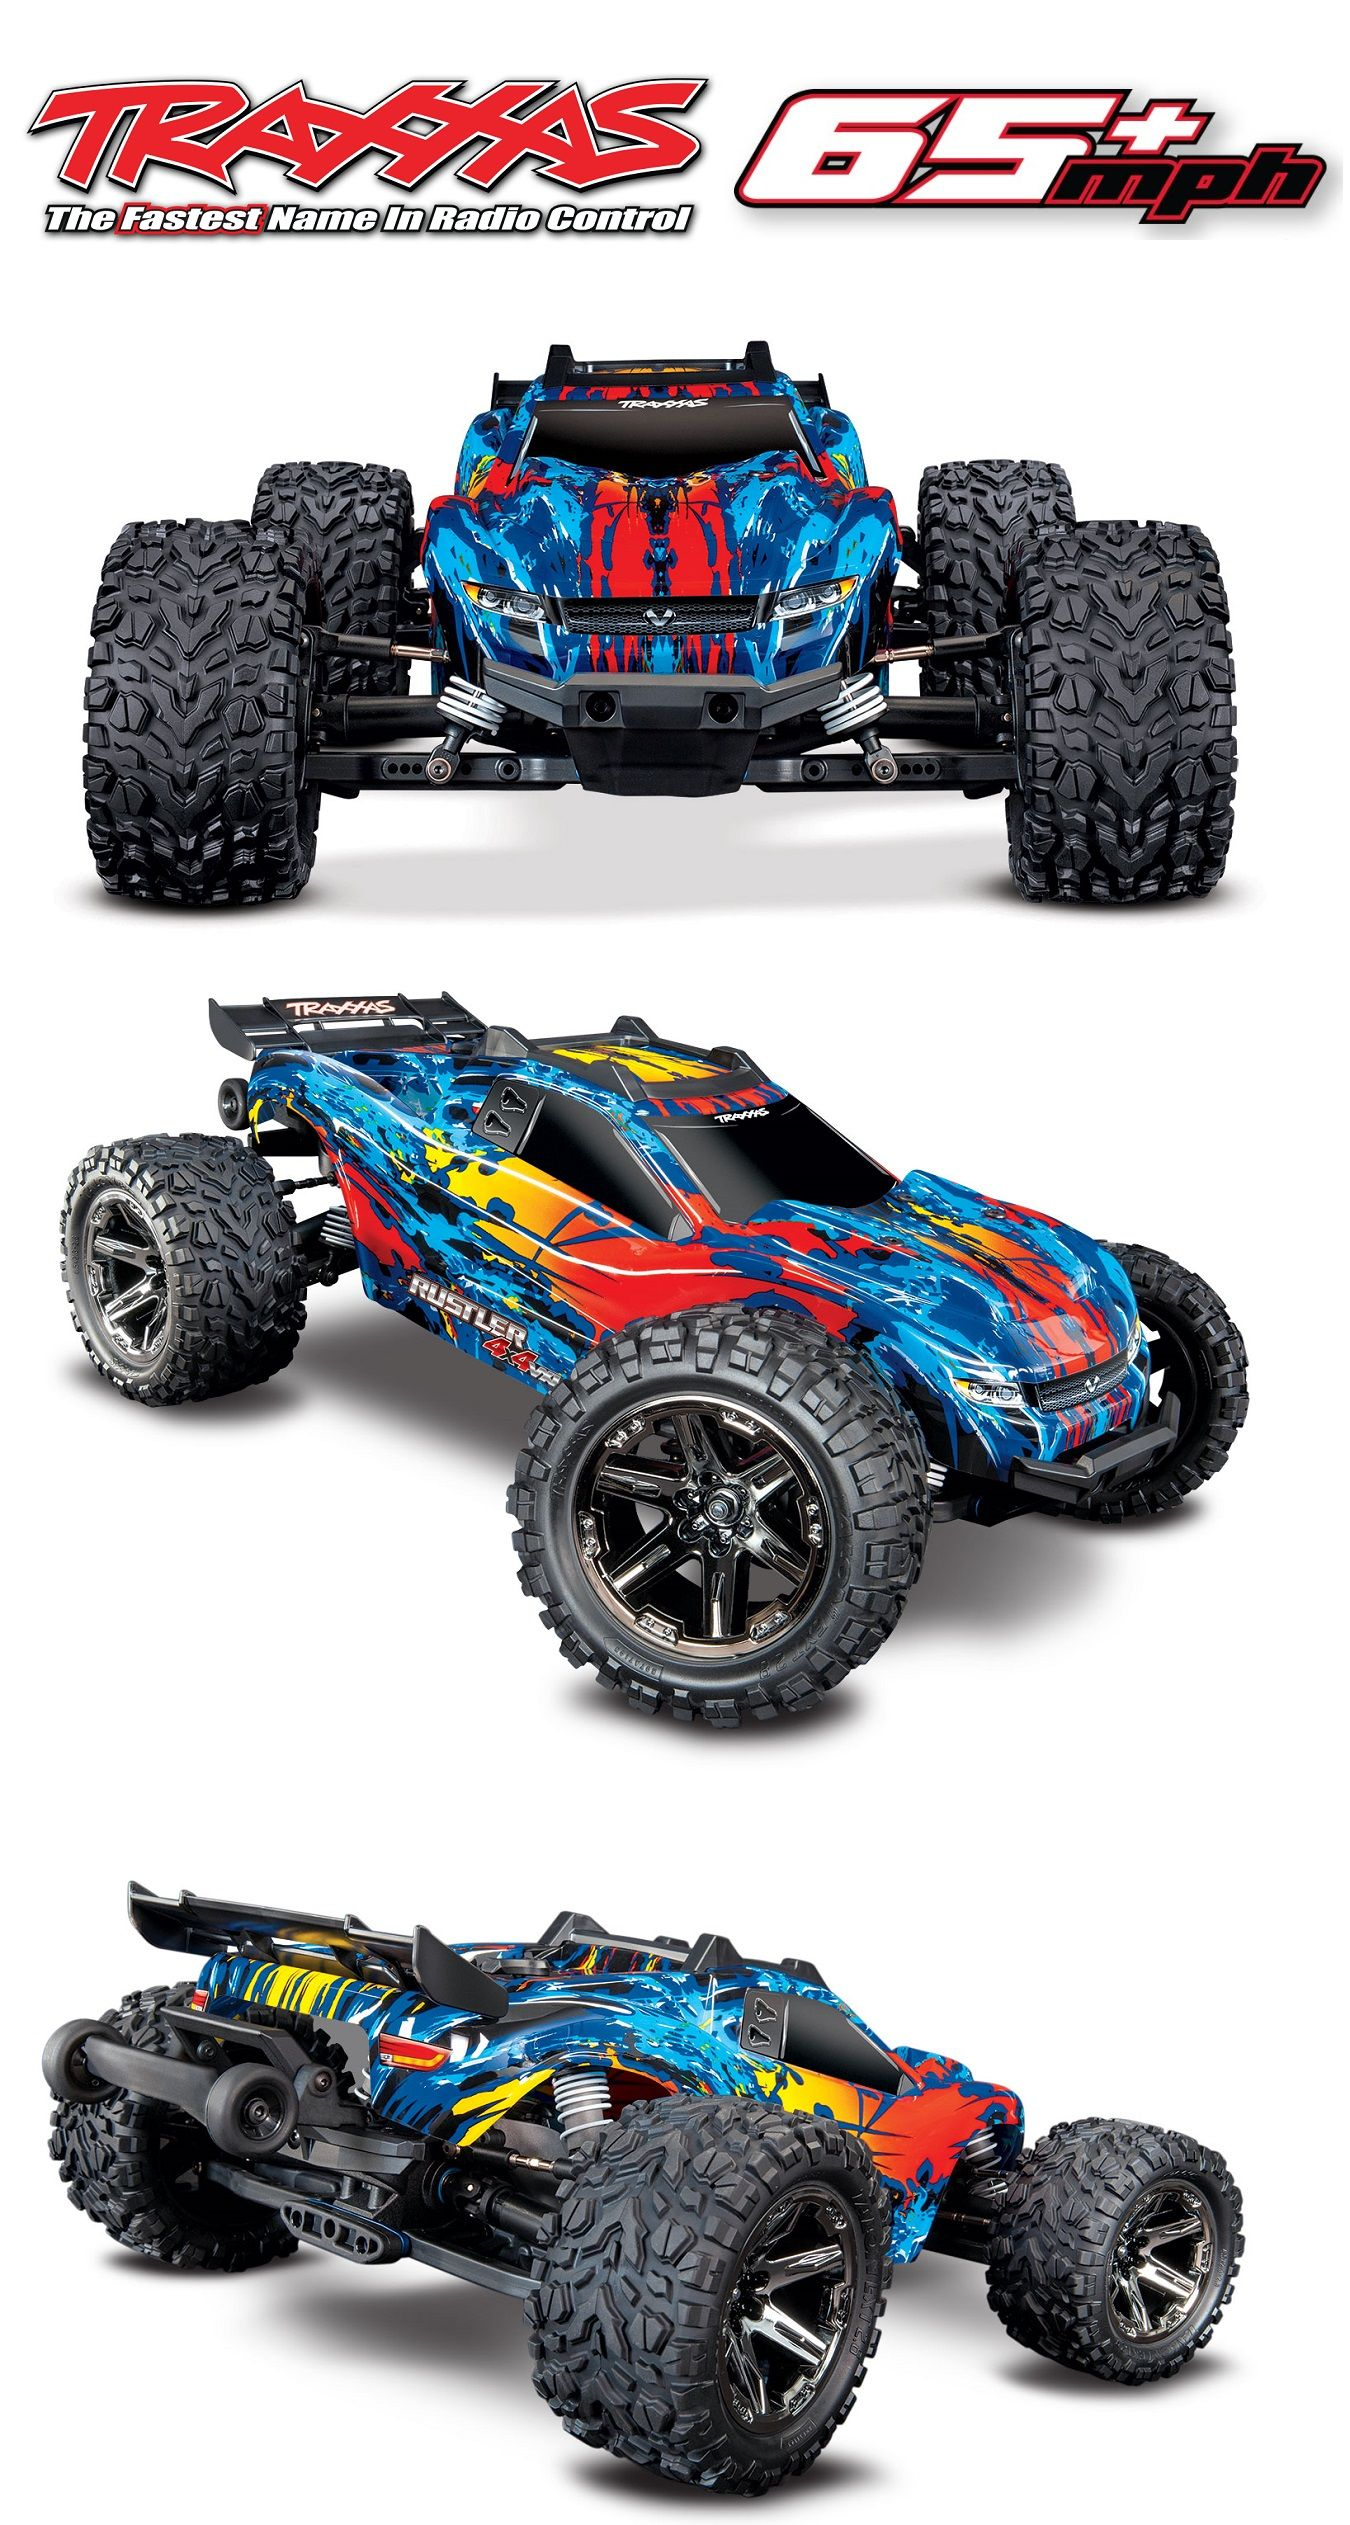 All New Traxxas Rustler 4x4 VXL RC Stadium Truck Coming Soon